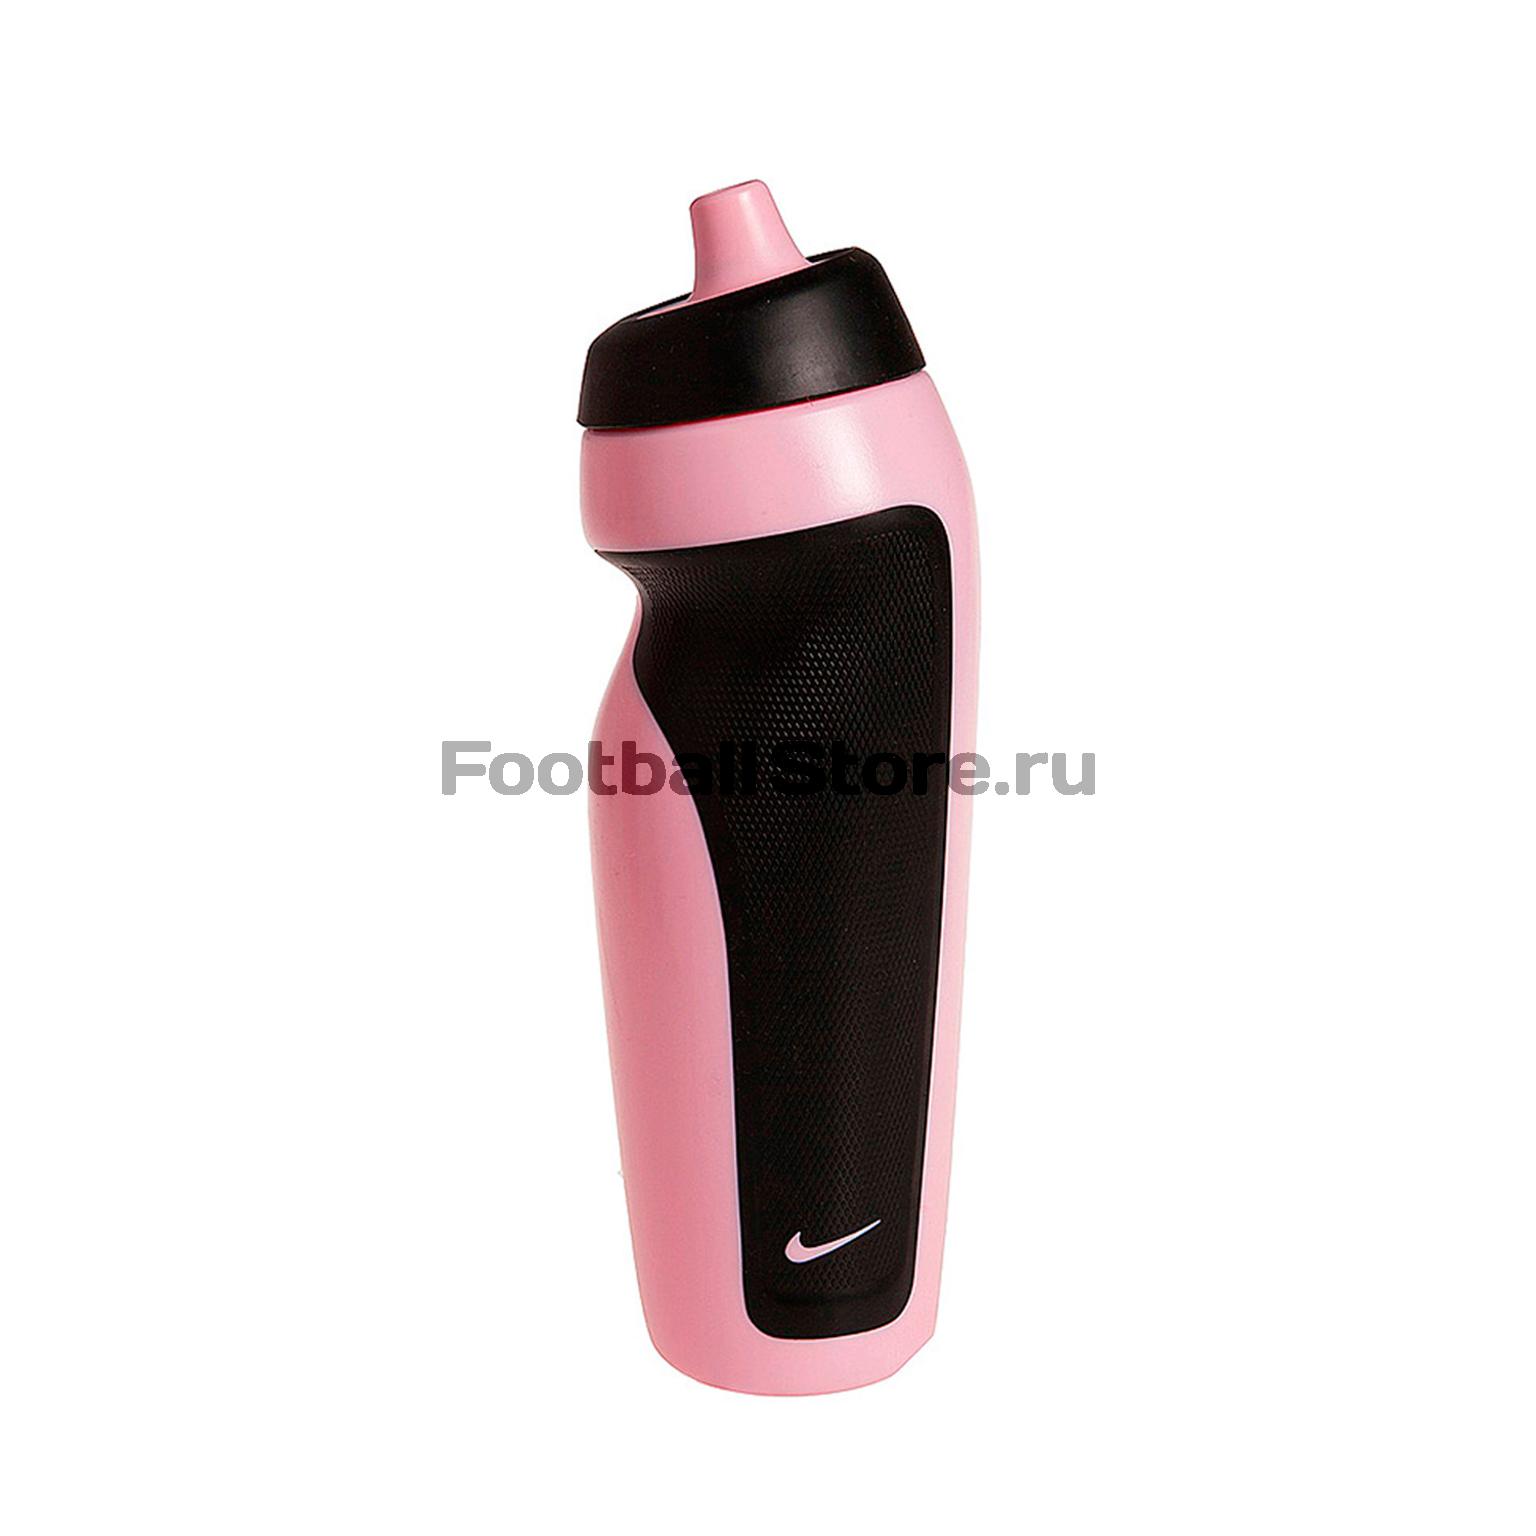 Бутылка для воды Nike Sport Water Bottle 9.341.009.623